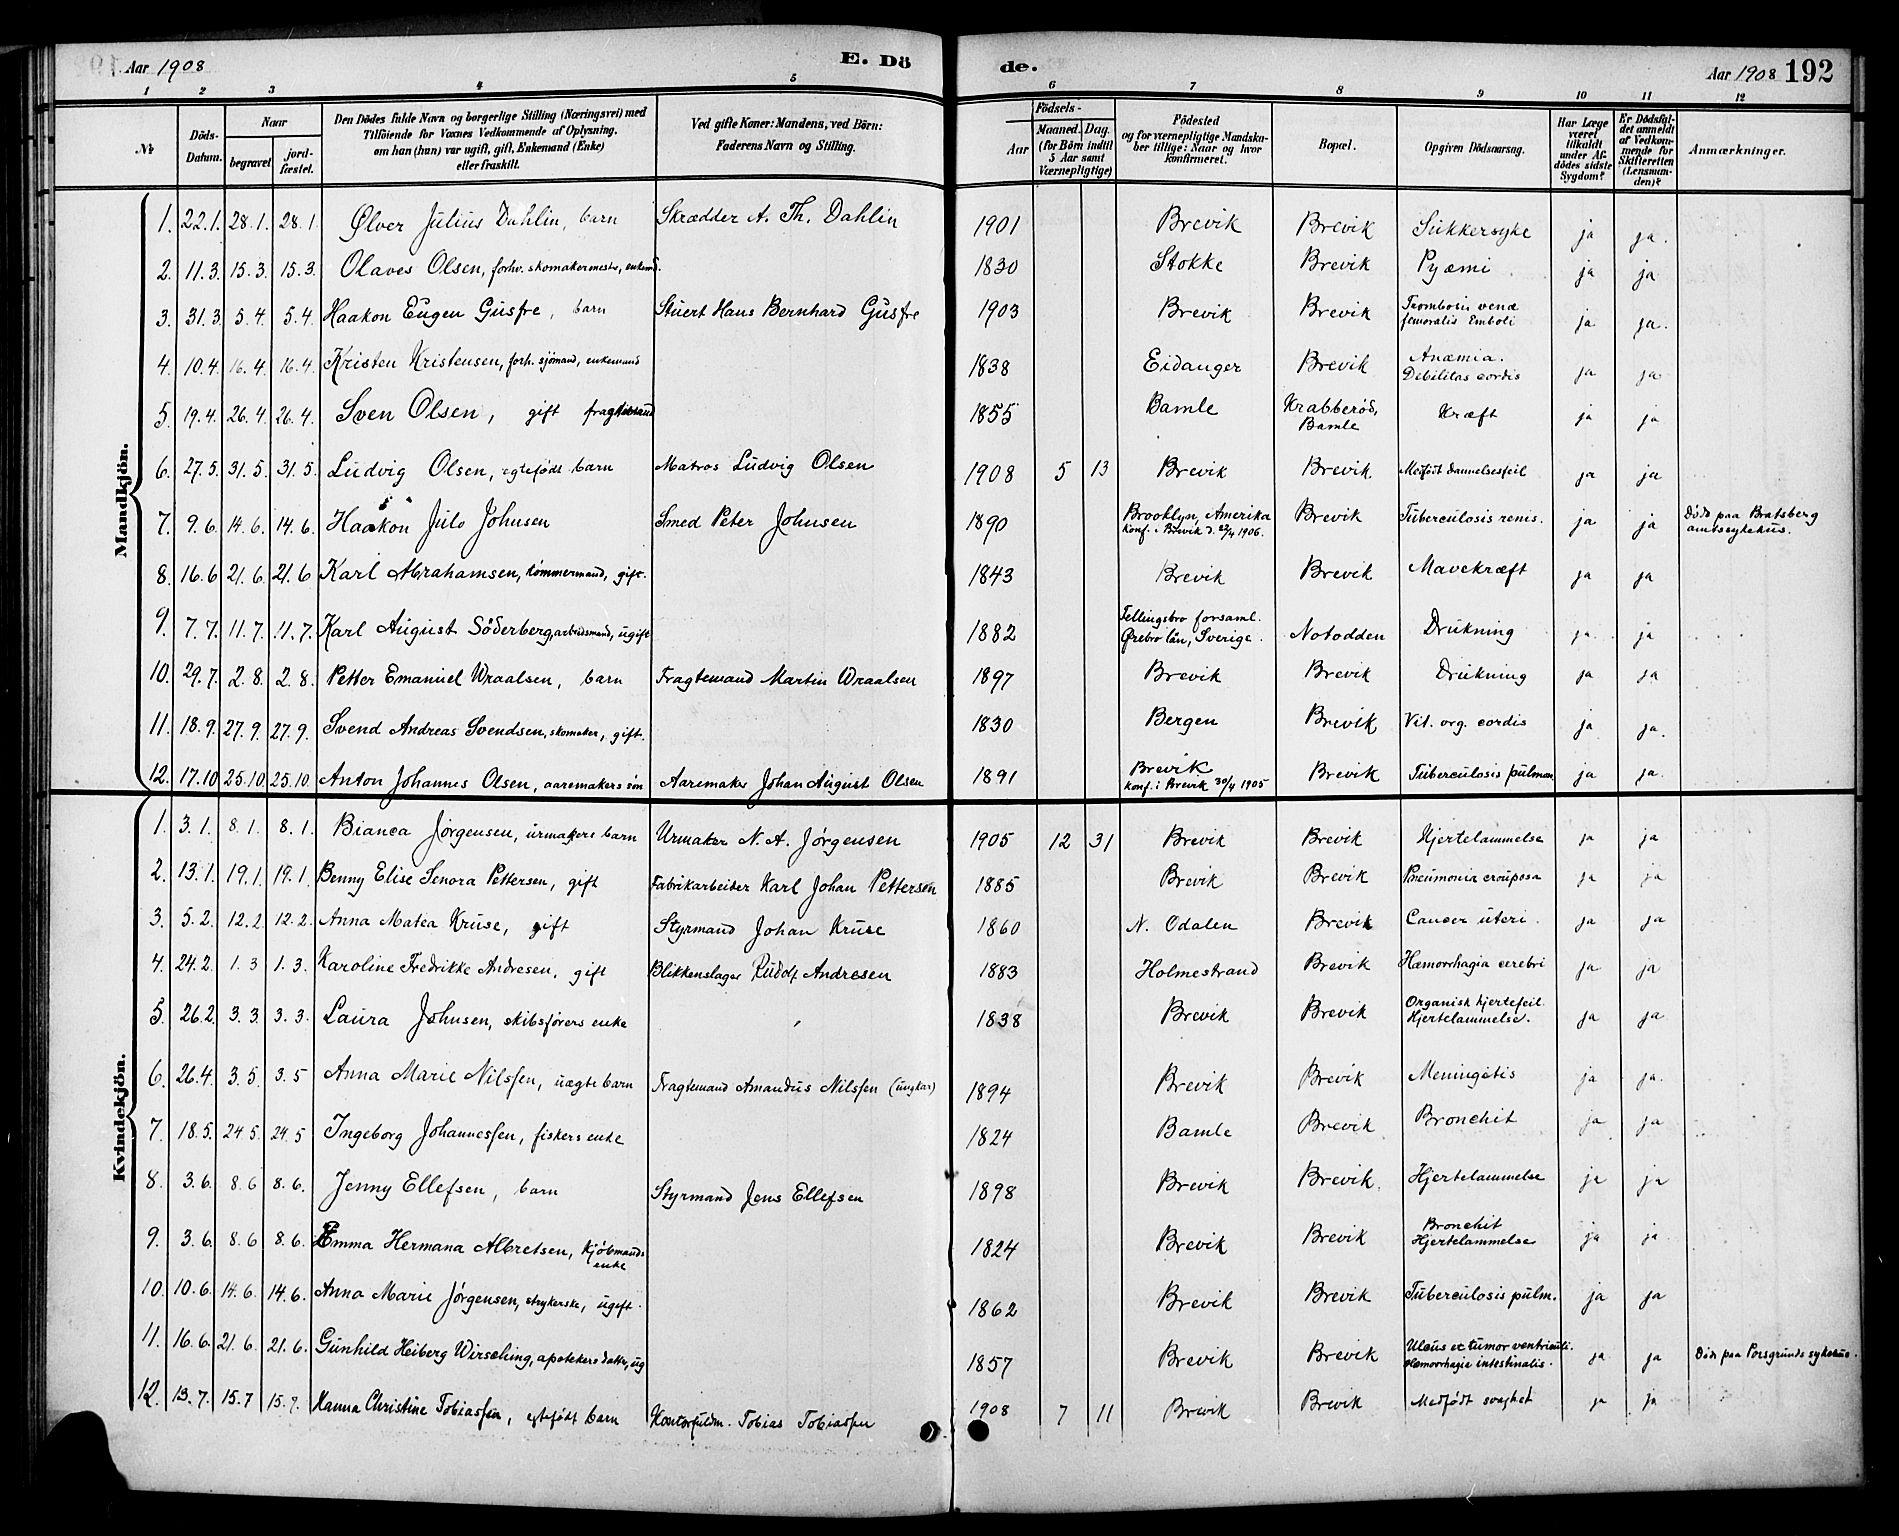 SAKO, Brevik kirkebøker, G/Ga/L0005: Klokkerbok nr. 5, 1901-1924, s. 192